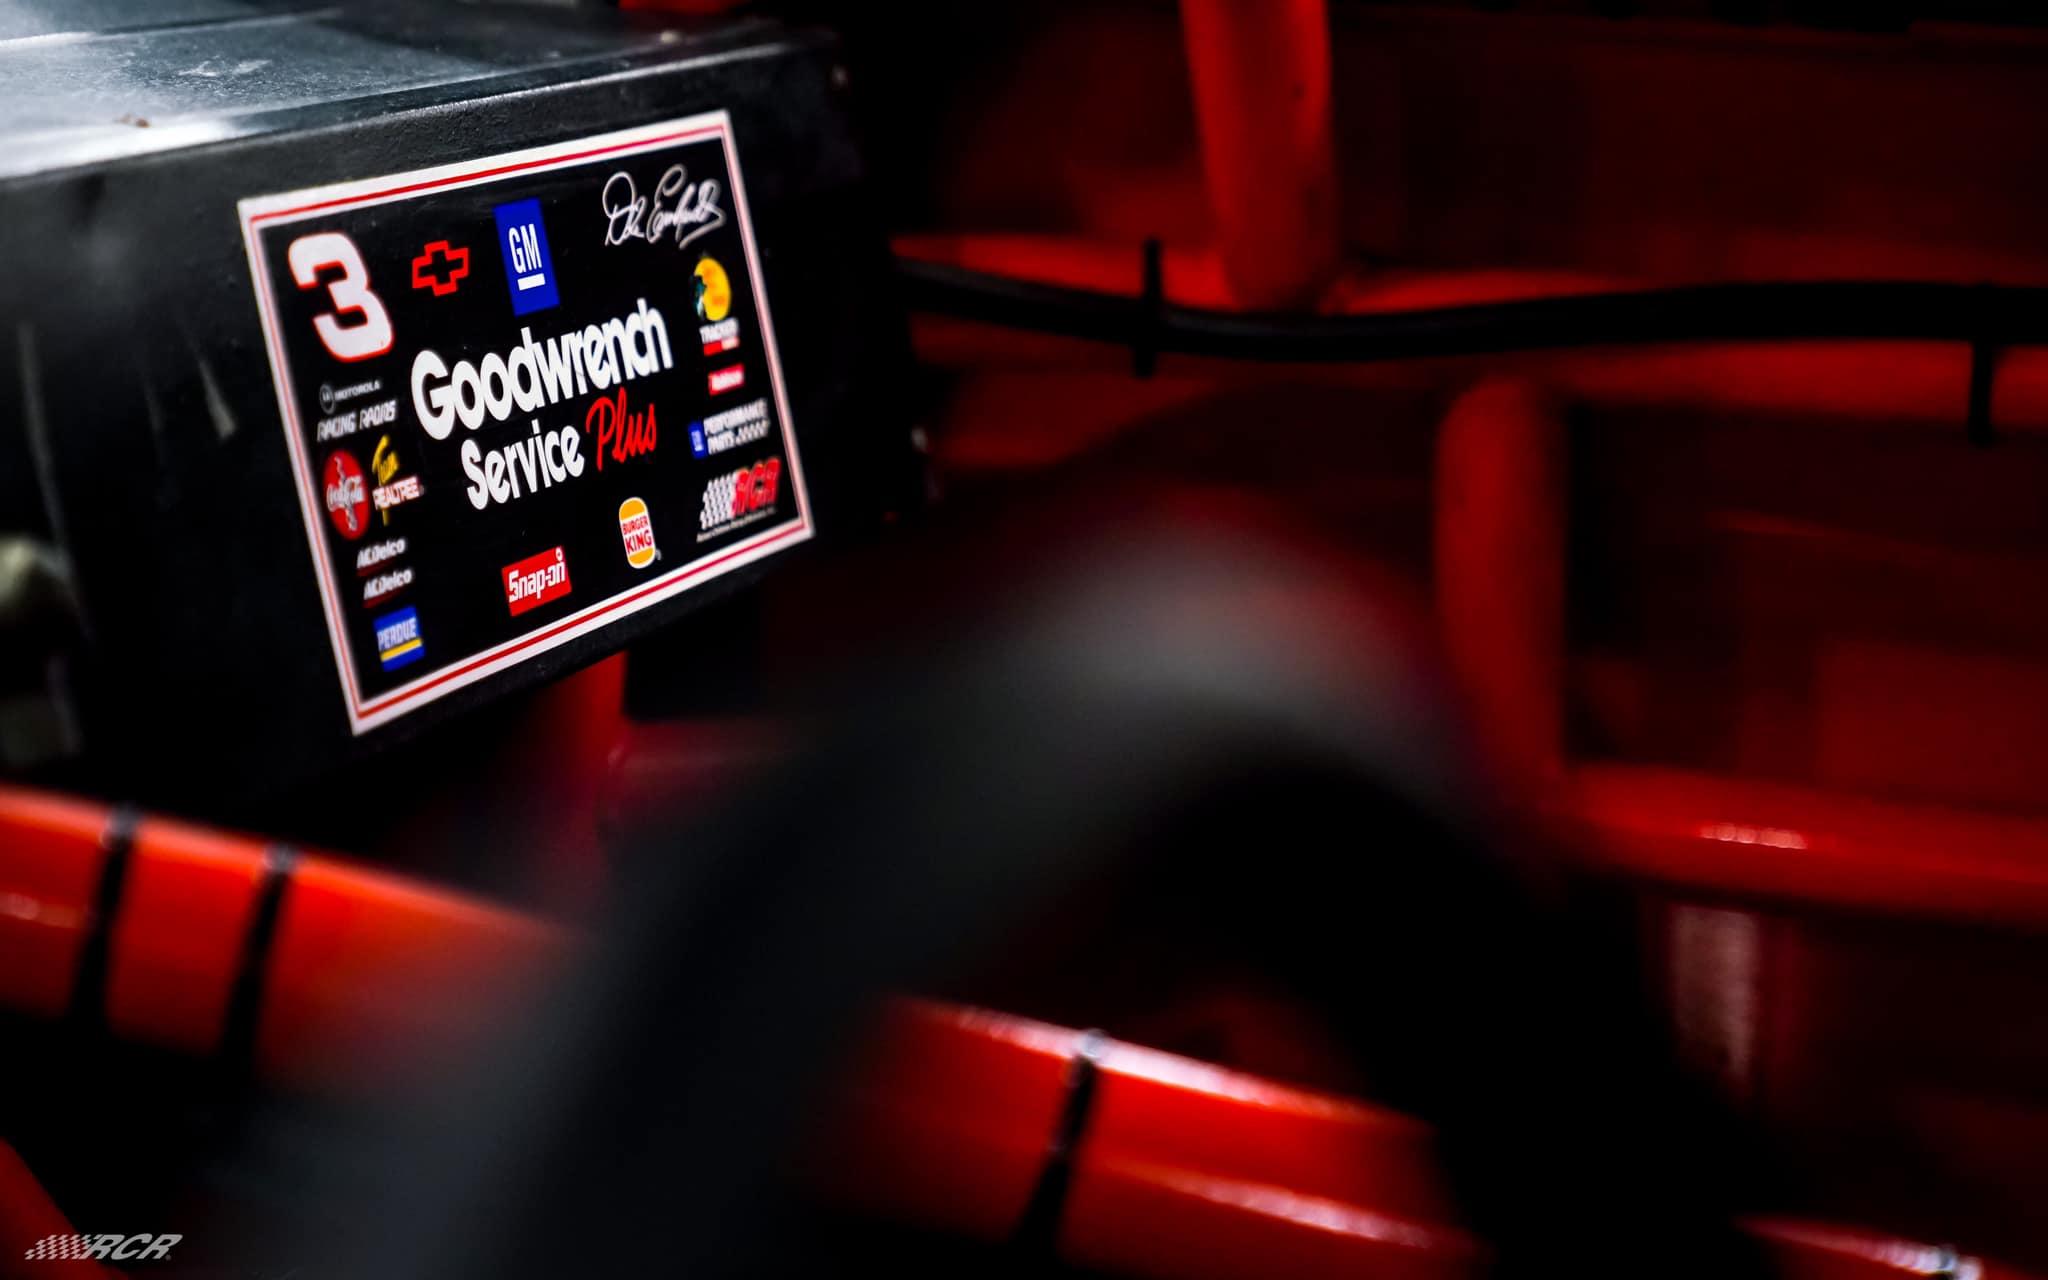 NASCAR cockpit - Dale Earnhardt 3 car